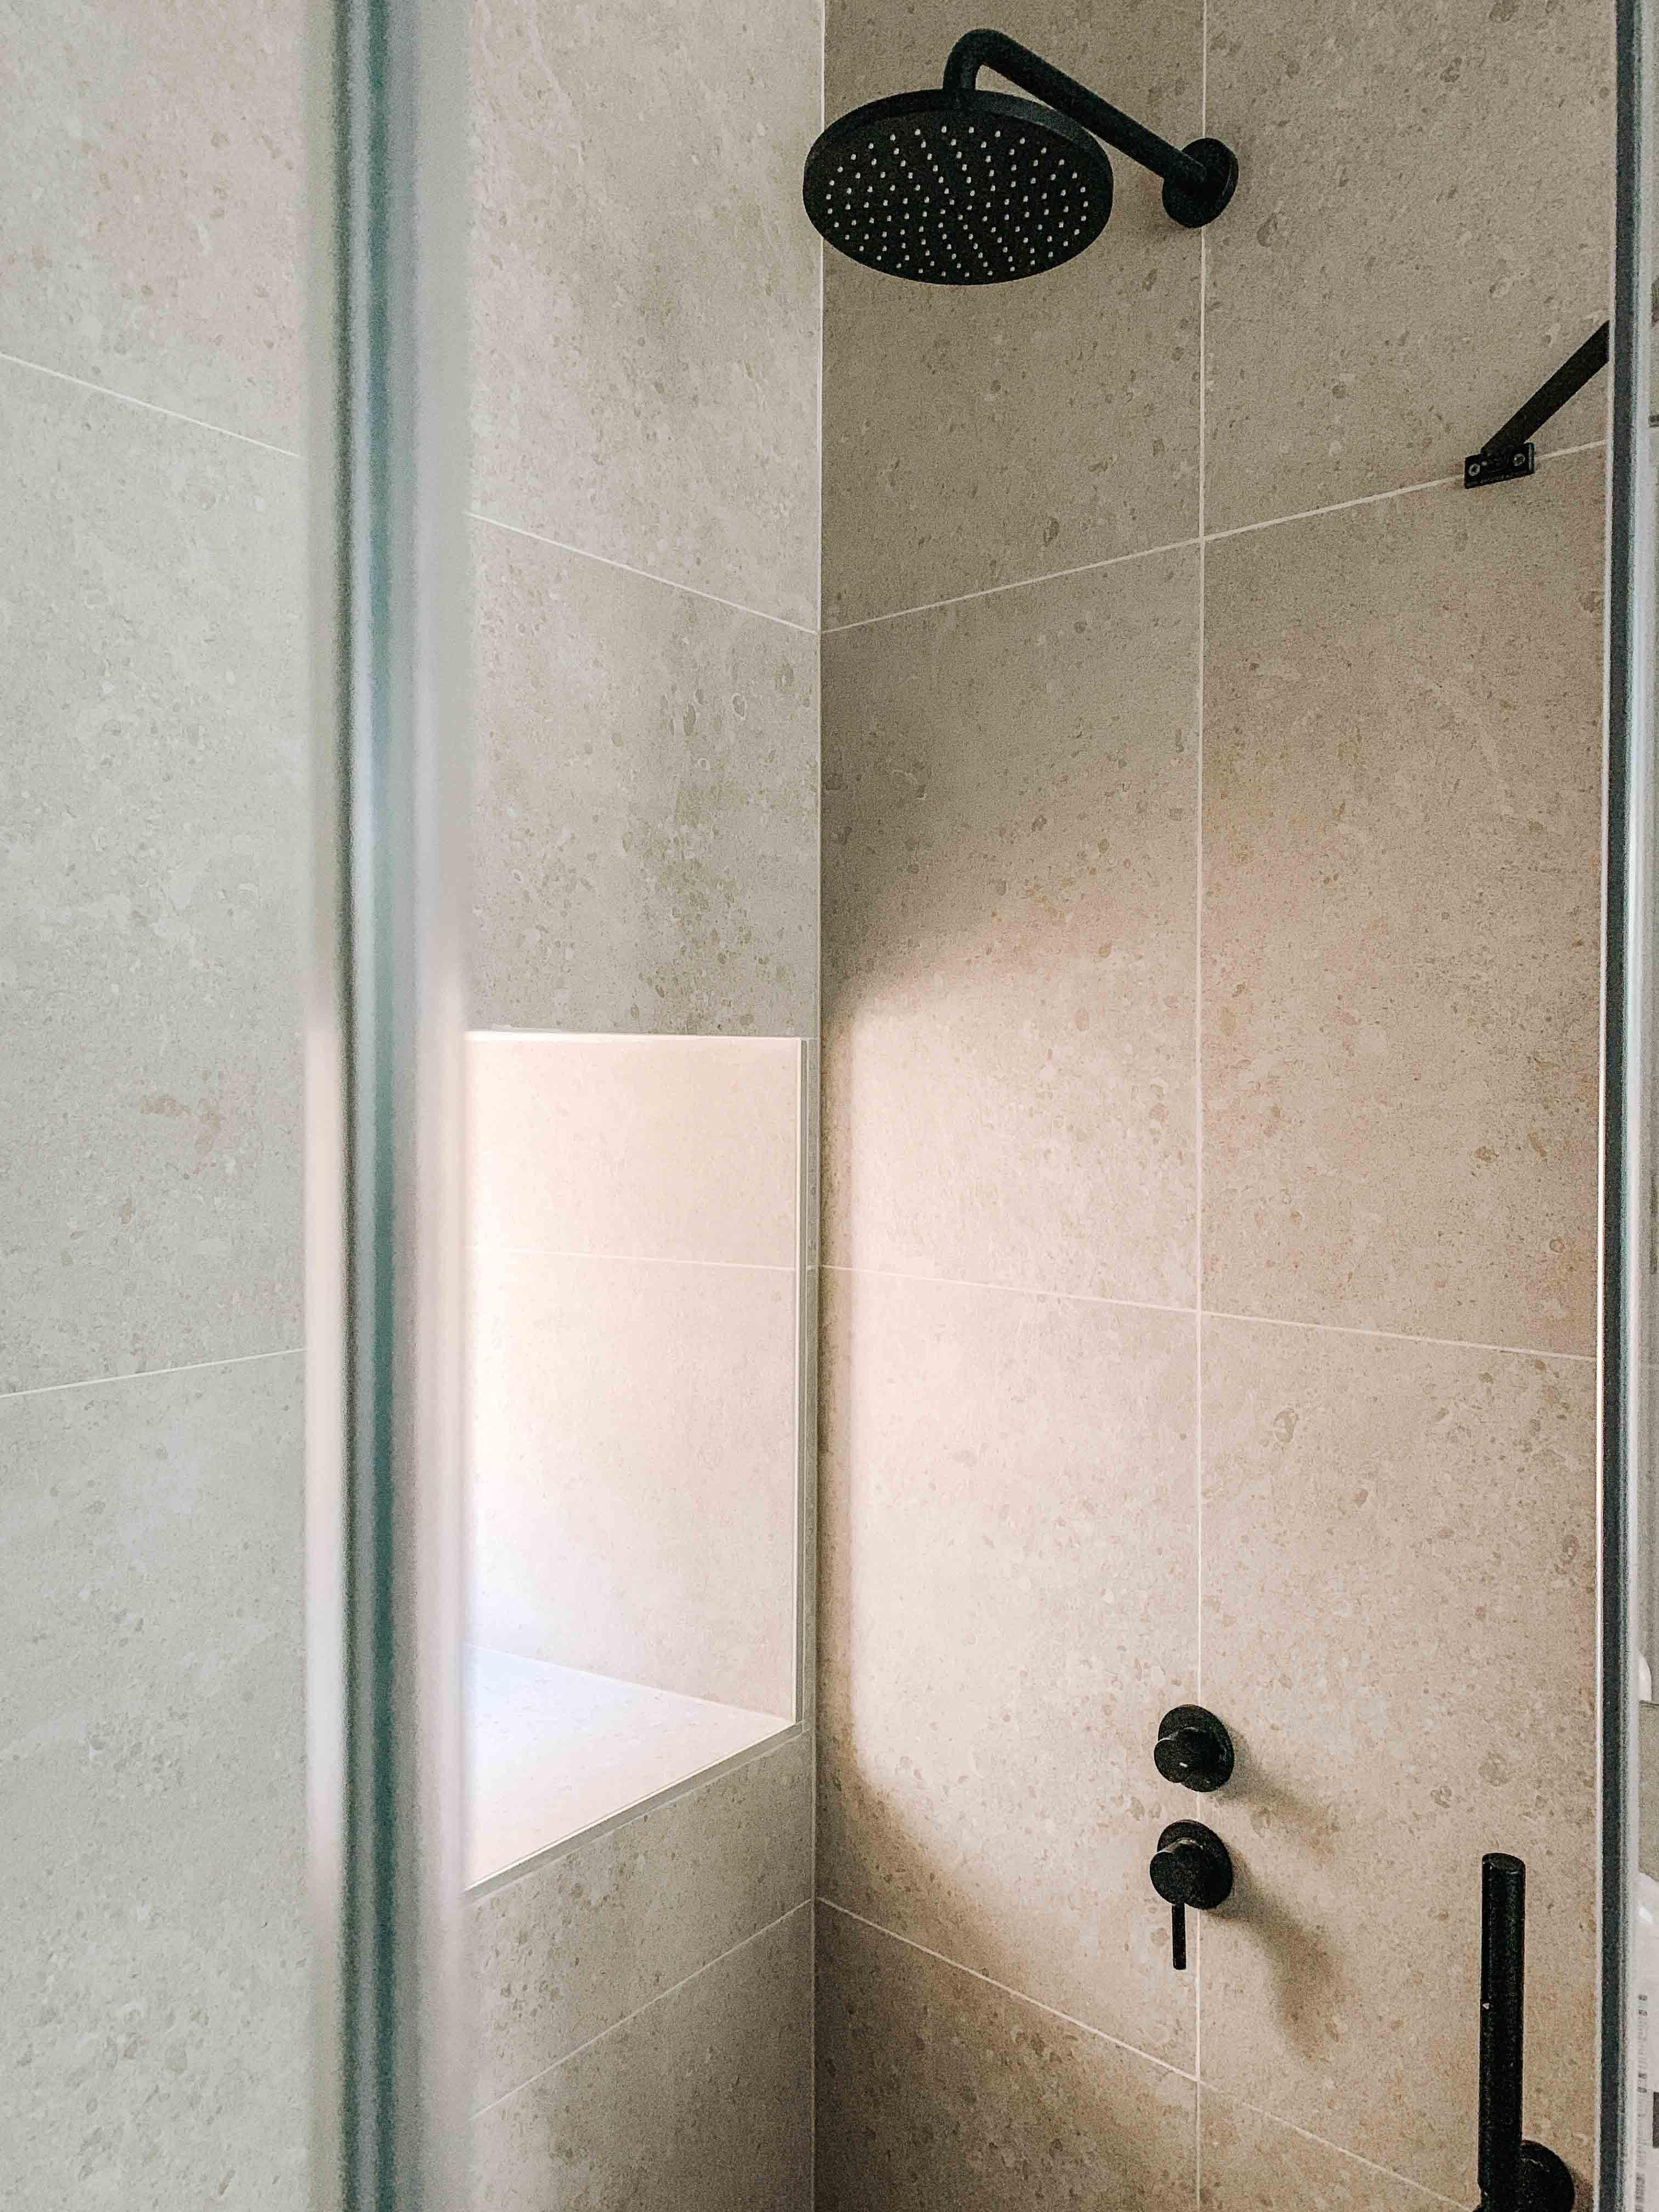 architecte-lyon-rénovation-presbytere-marcilly-azergues-pierre-dorée-4